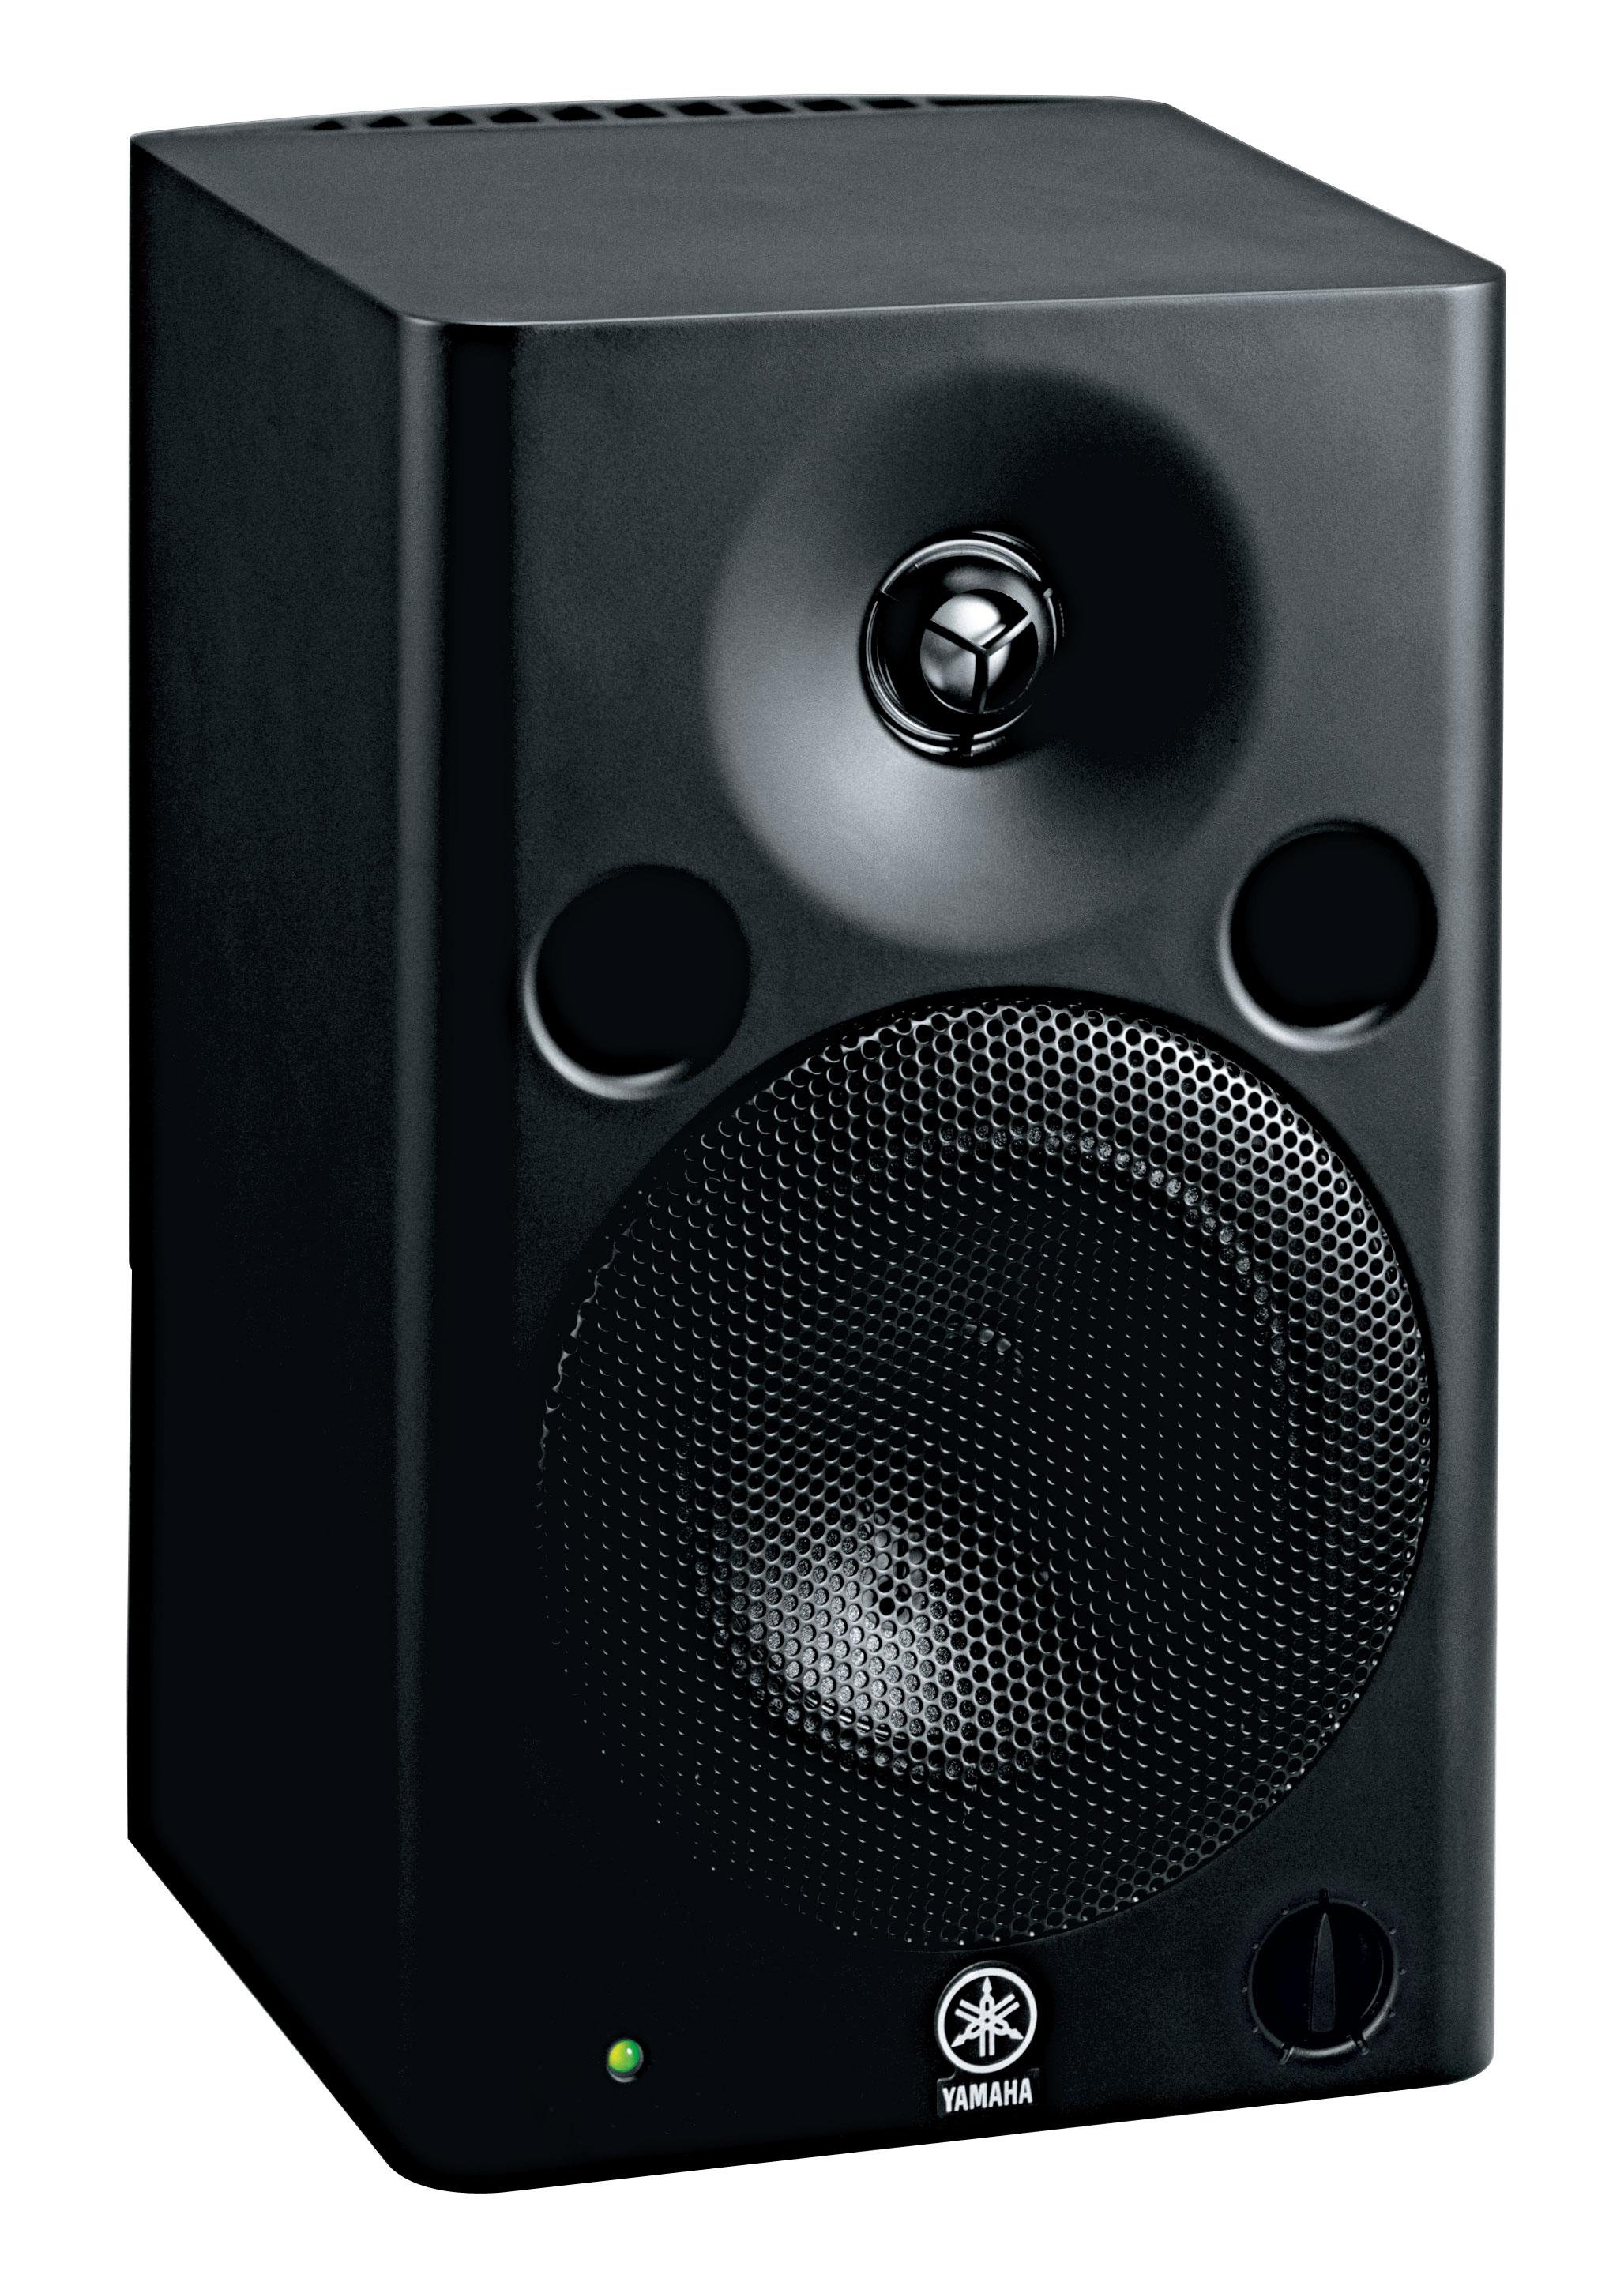 yamaha msp5 studio monitor speaker yamaha music london. Black Bedroom Furniture Sets. Home Design Ideas